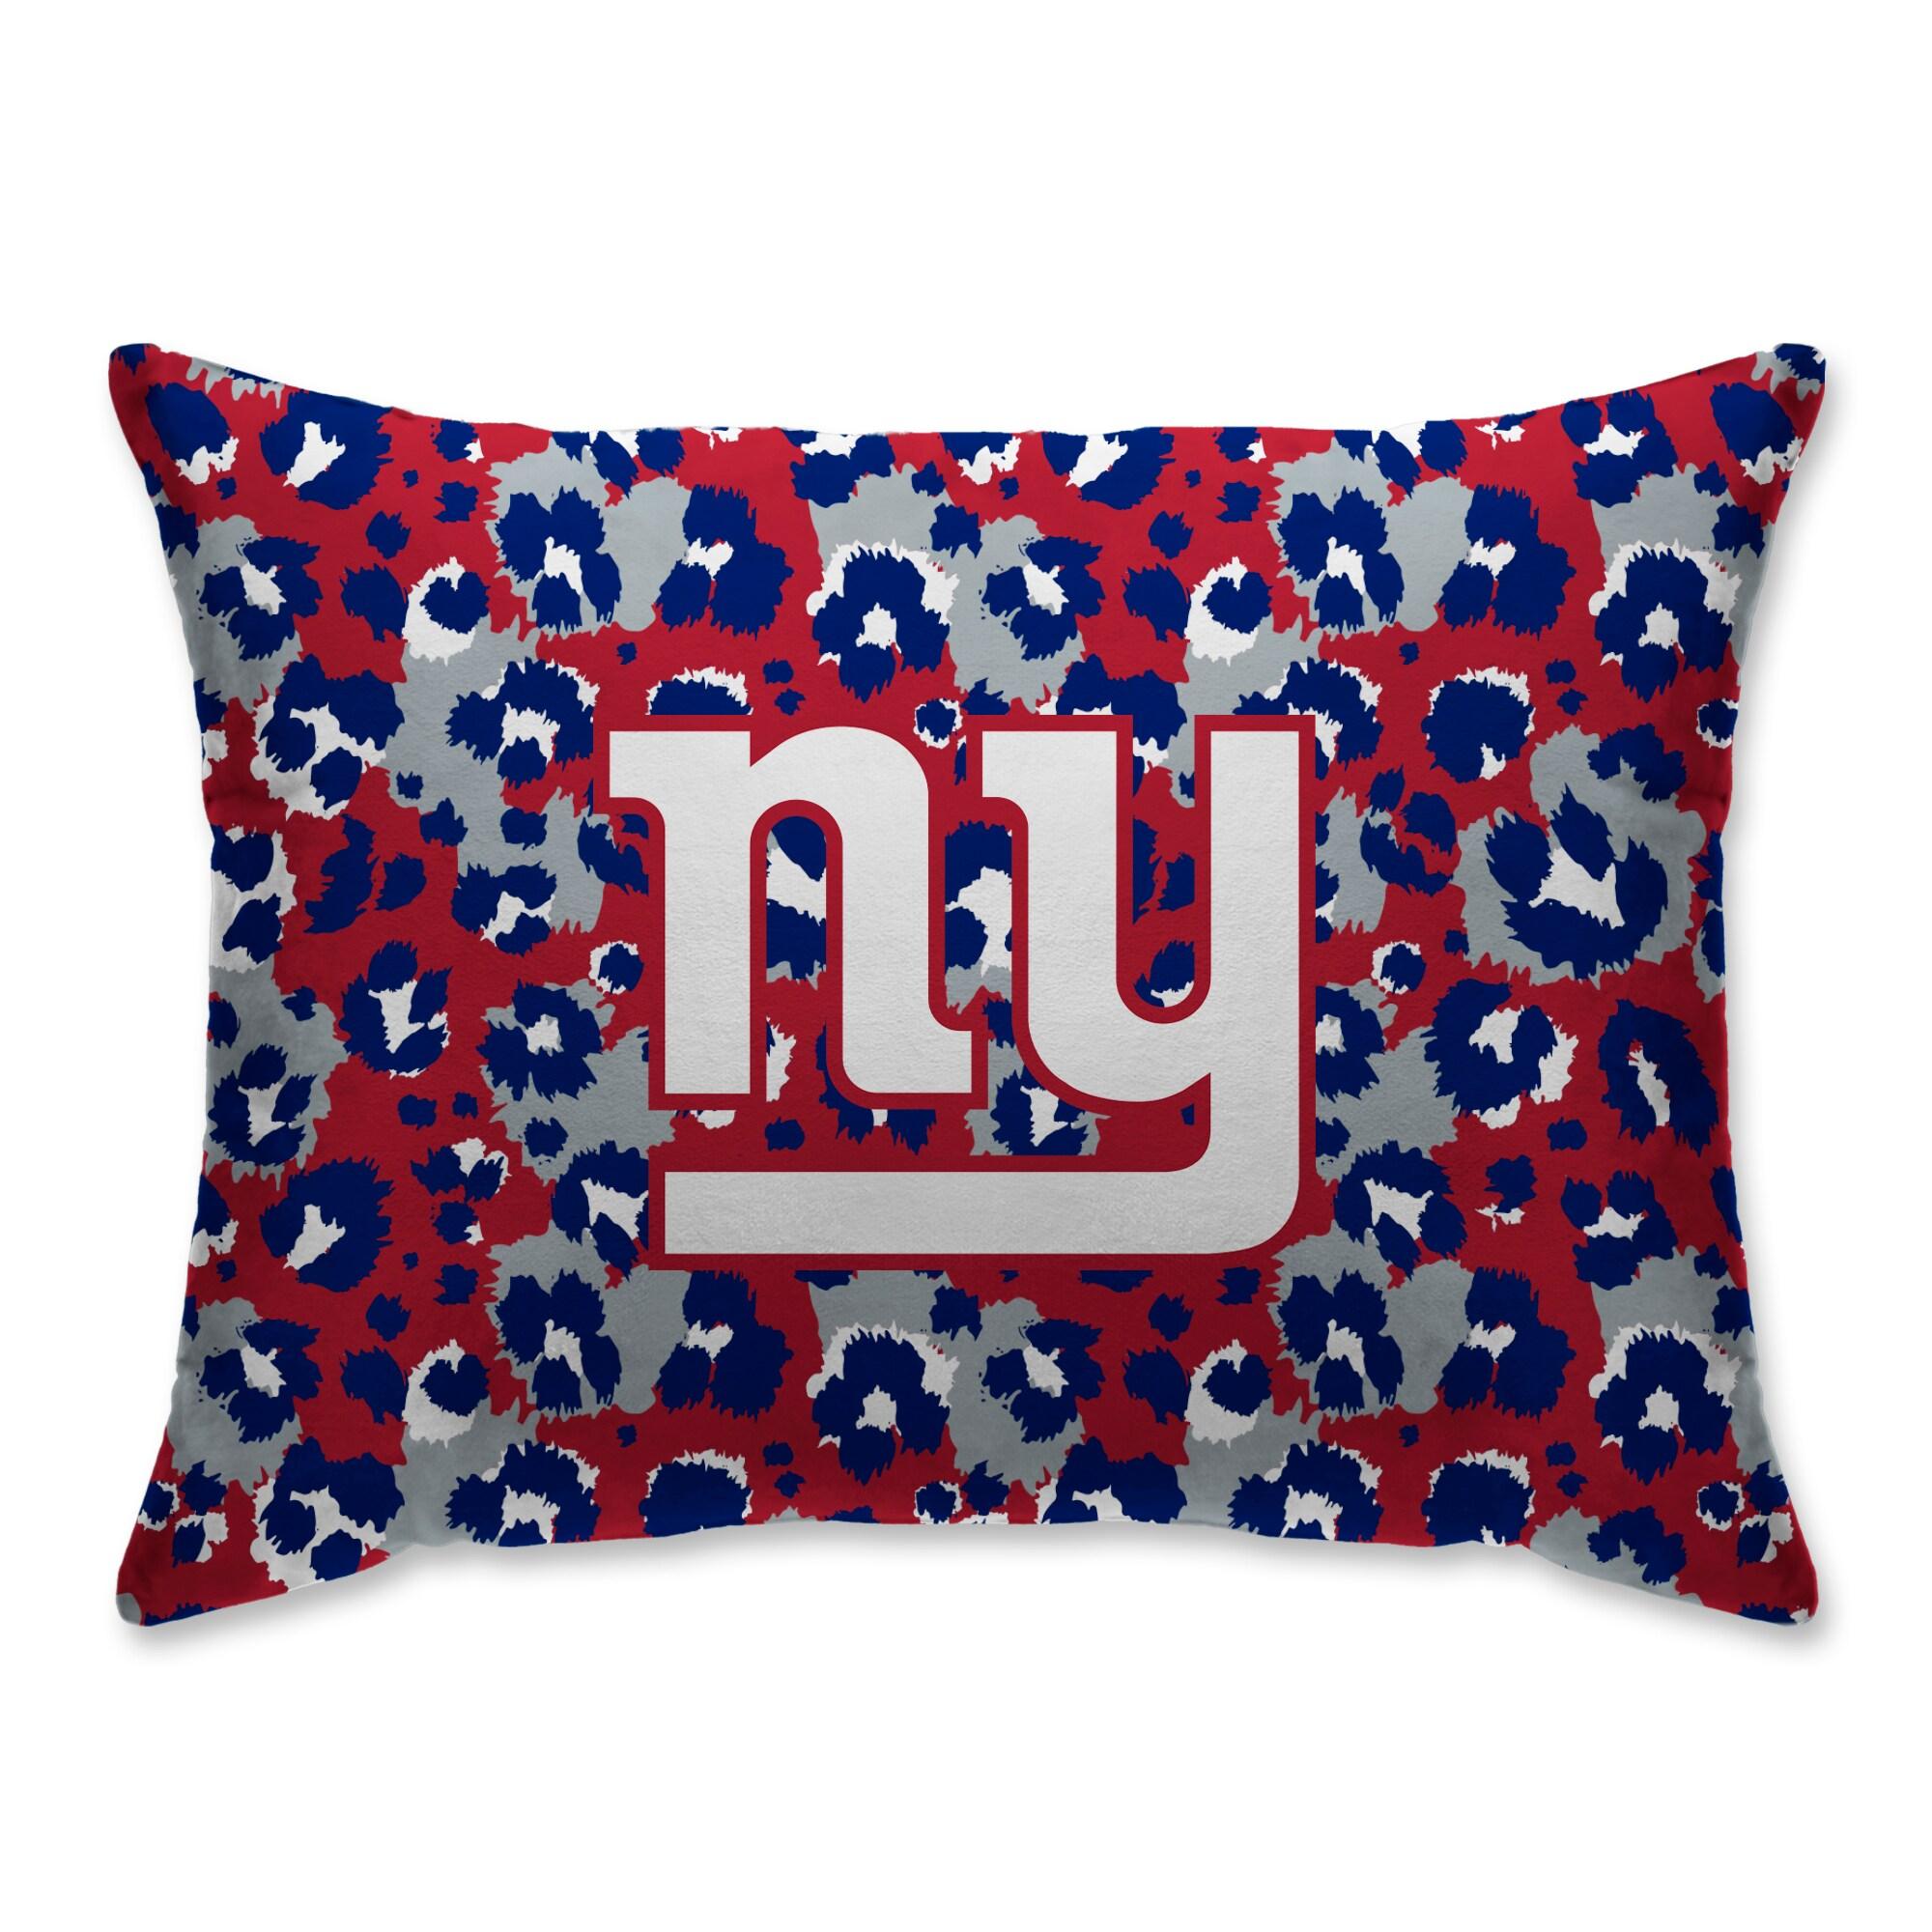 New York Giants Leopard Plush Bed Pillow - Blue